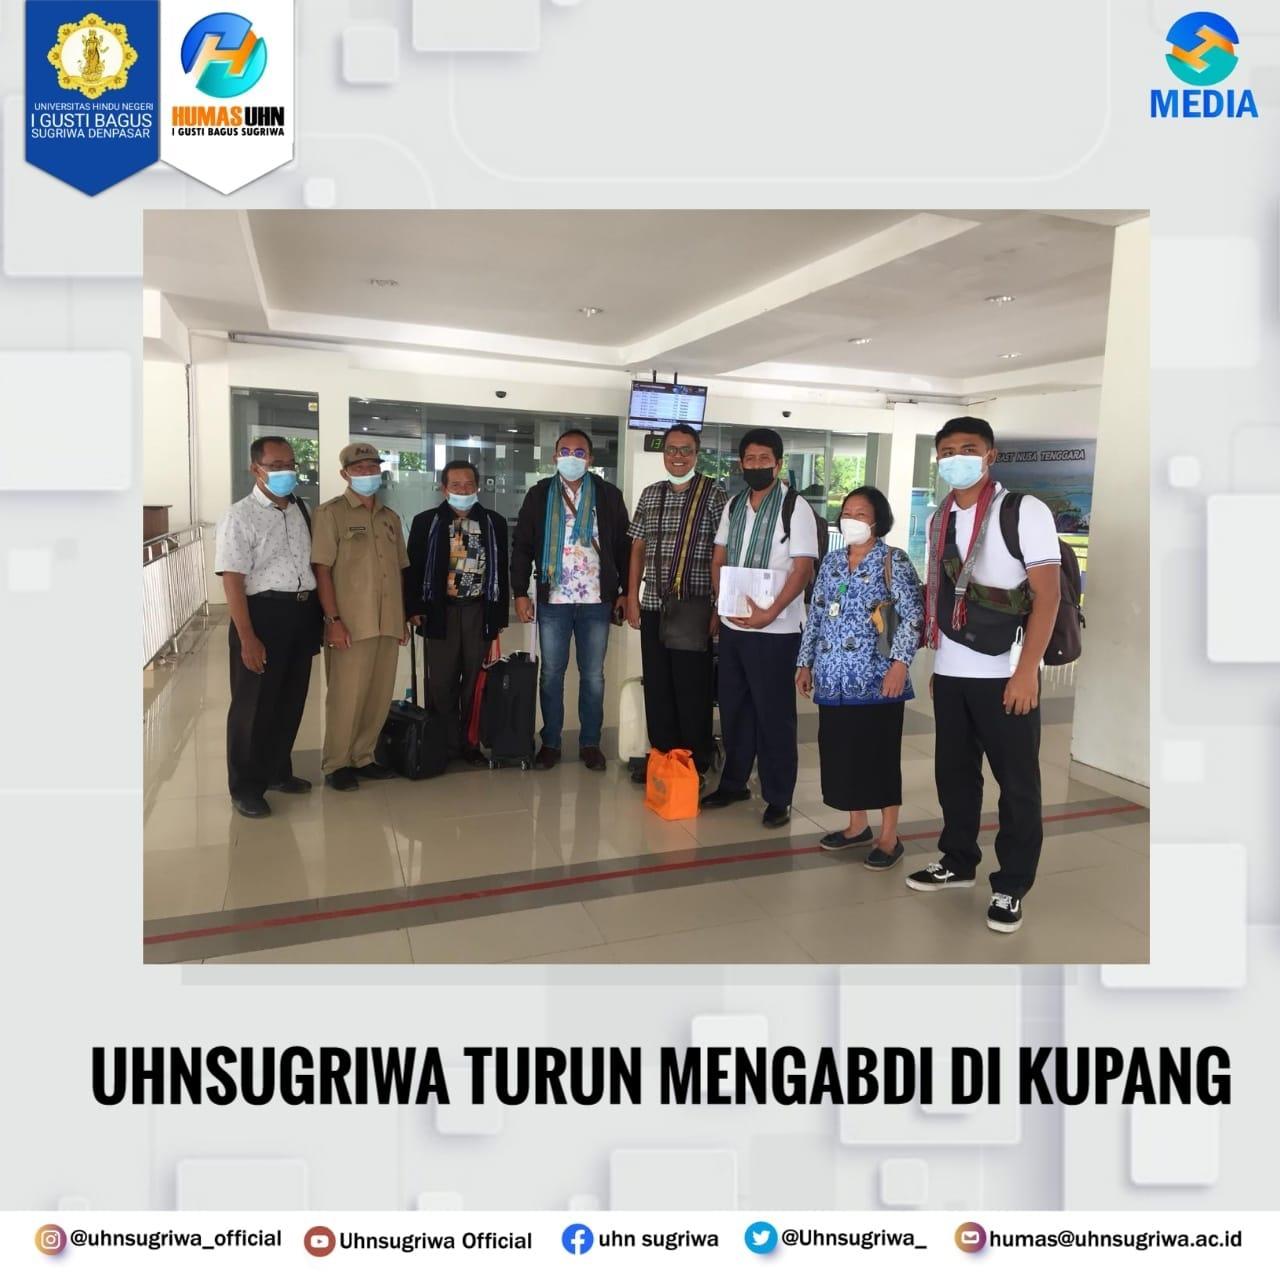 5 TIM UHN SUGRIWA TURUN PENGABDIAN DI KUPANG, NTT